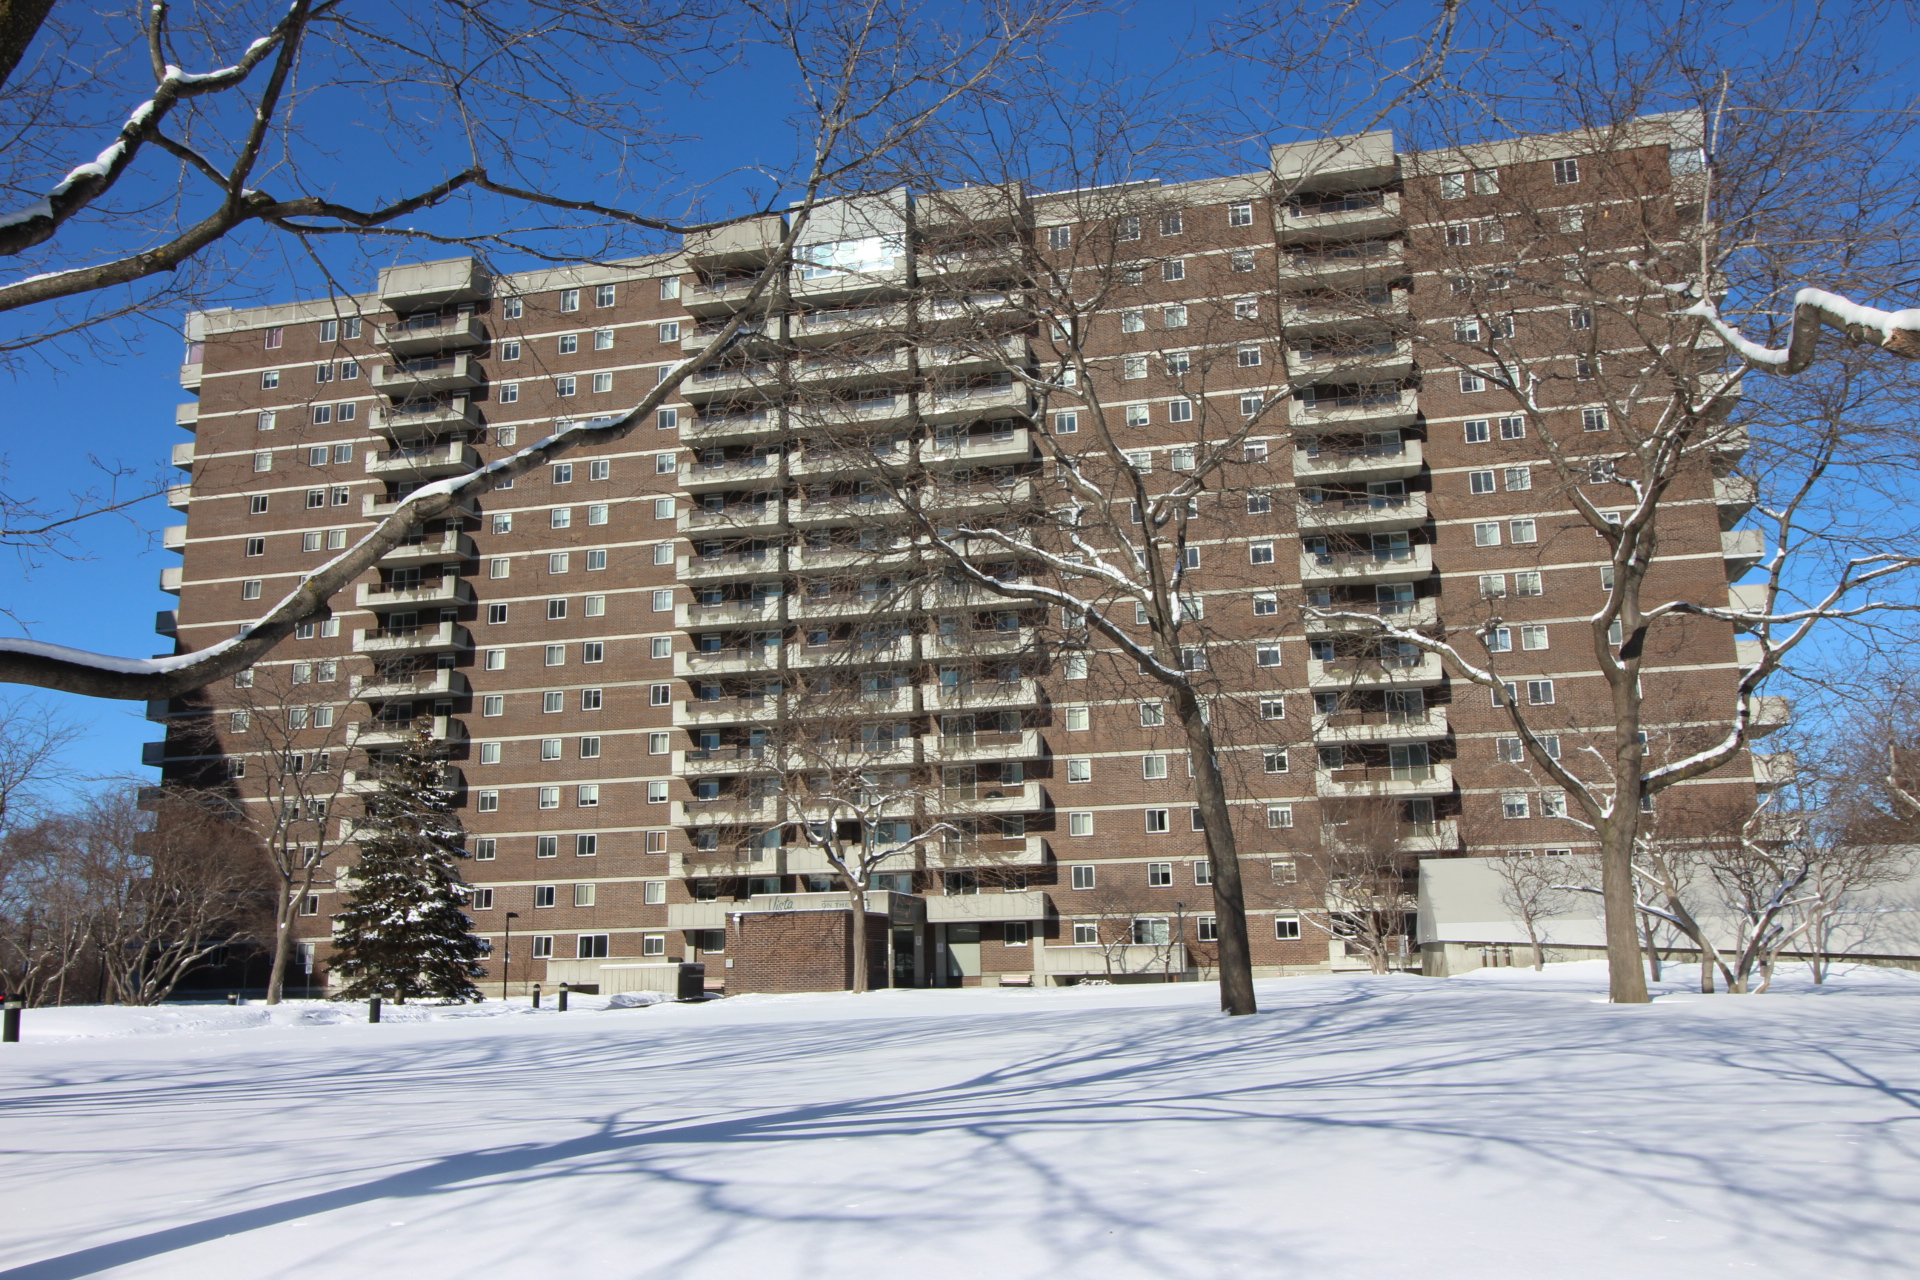 110-1705 Playfair Dr - Lovely Spacious Condo Apartment in popular area of Alta Vista!